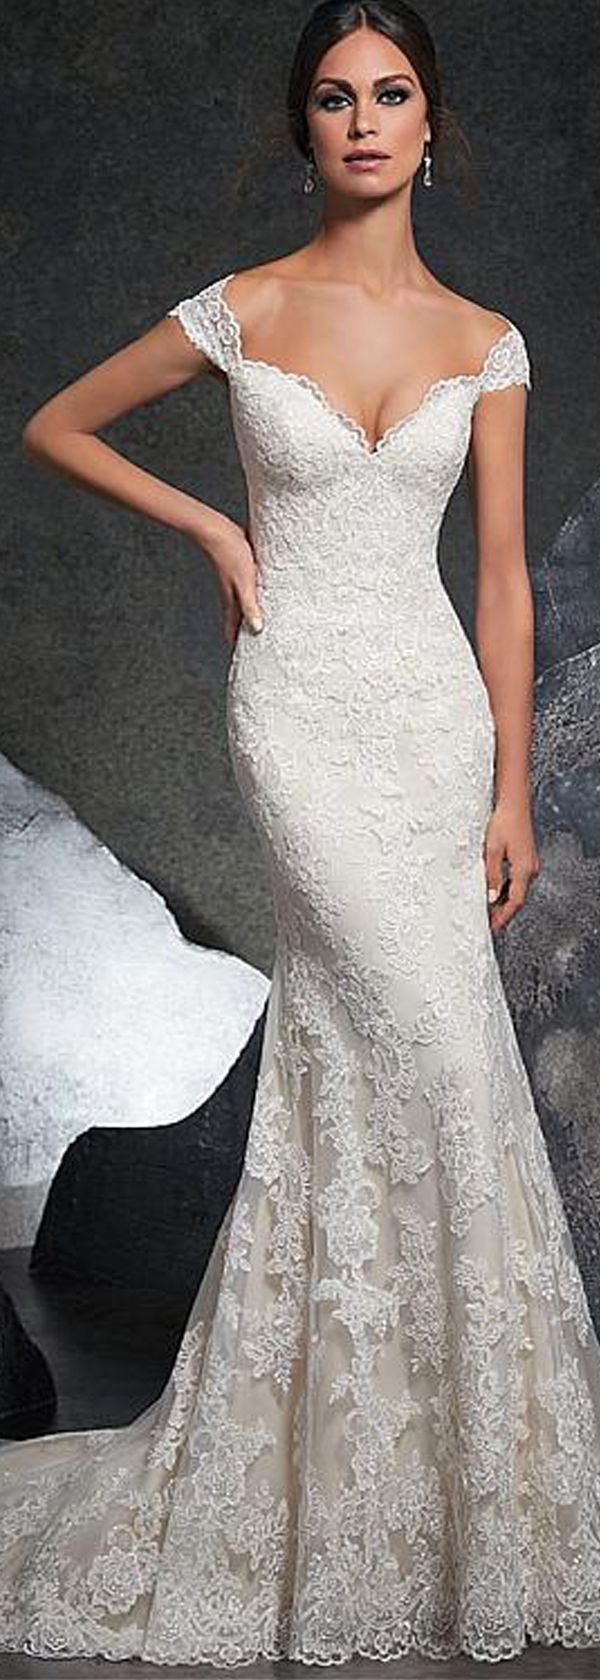 Grey mermaid wedding dress  Mermaid Wedding Dresses  Chic Tulle Offtheshoulder Neckline